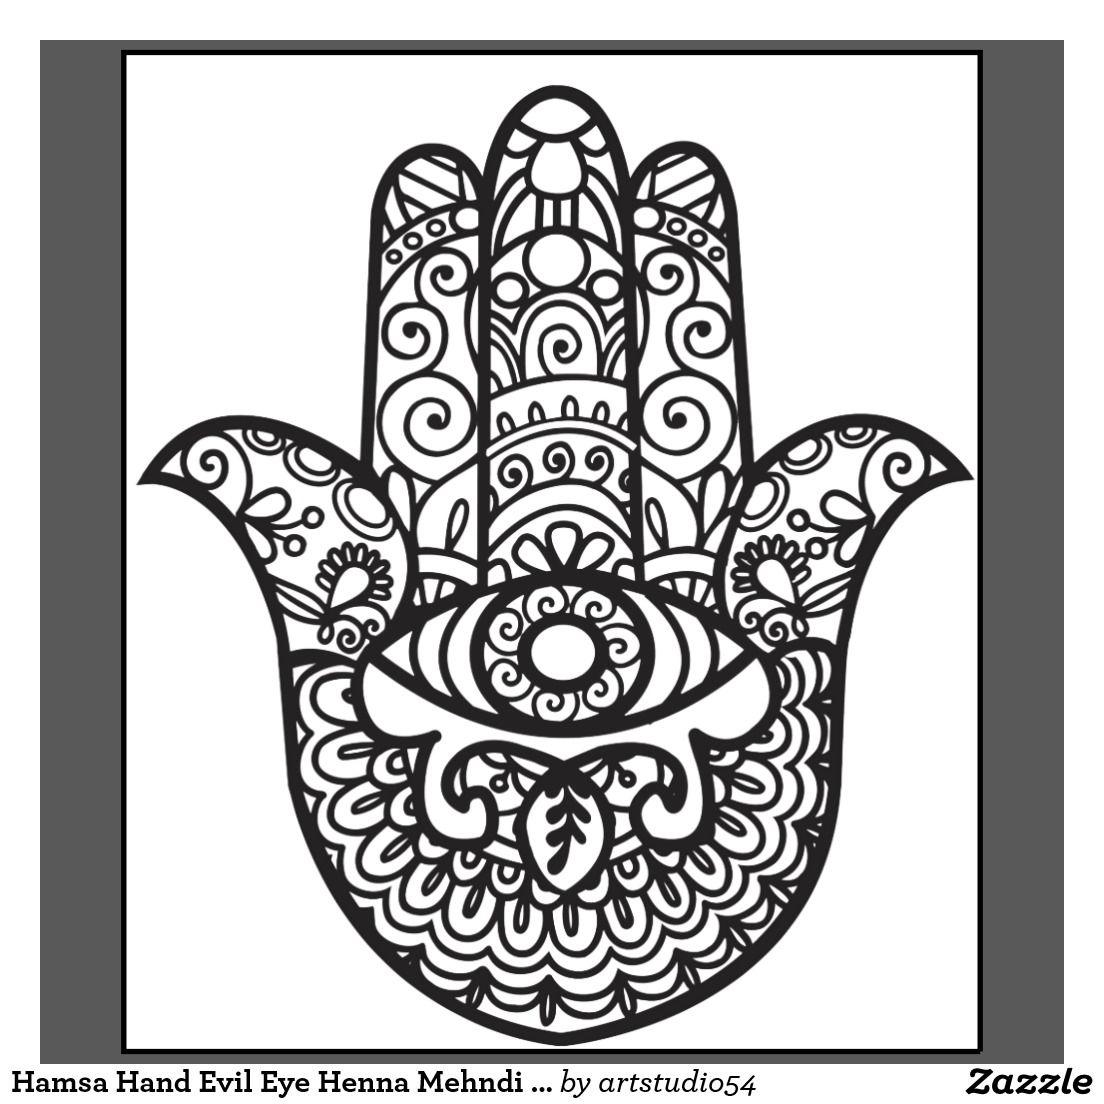 Henna Eye Tattoo: Hamsa Hand Evil Eye Henna Mehndi Style T-Shirt